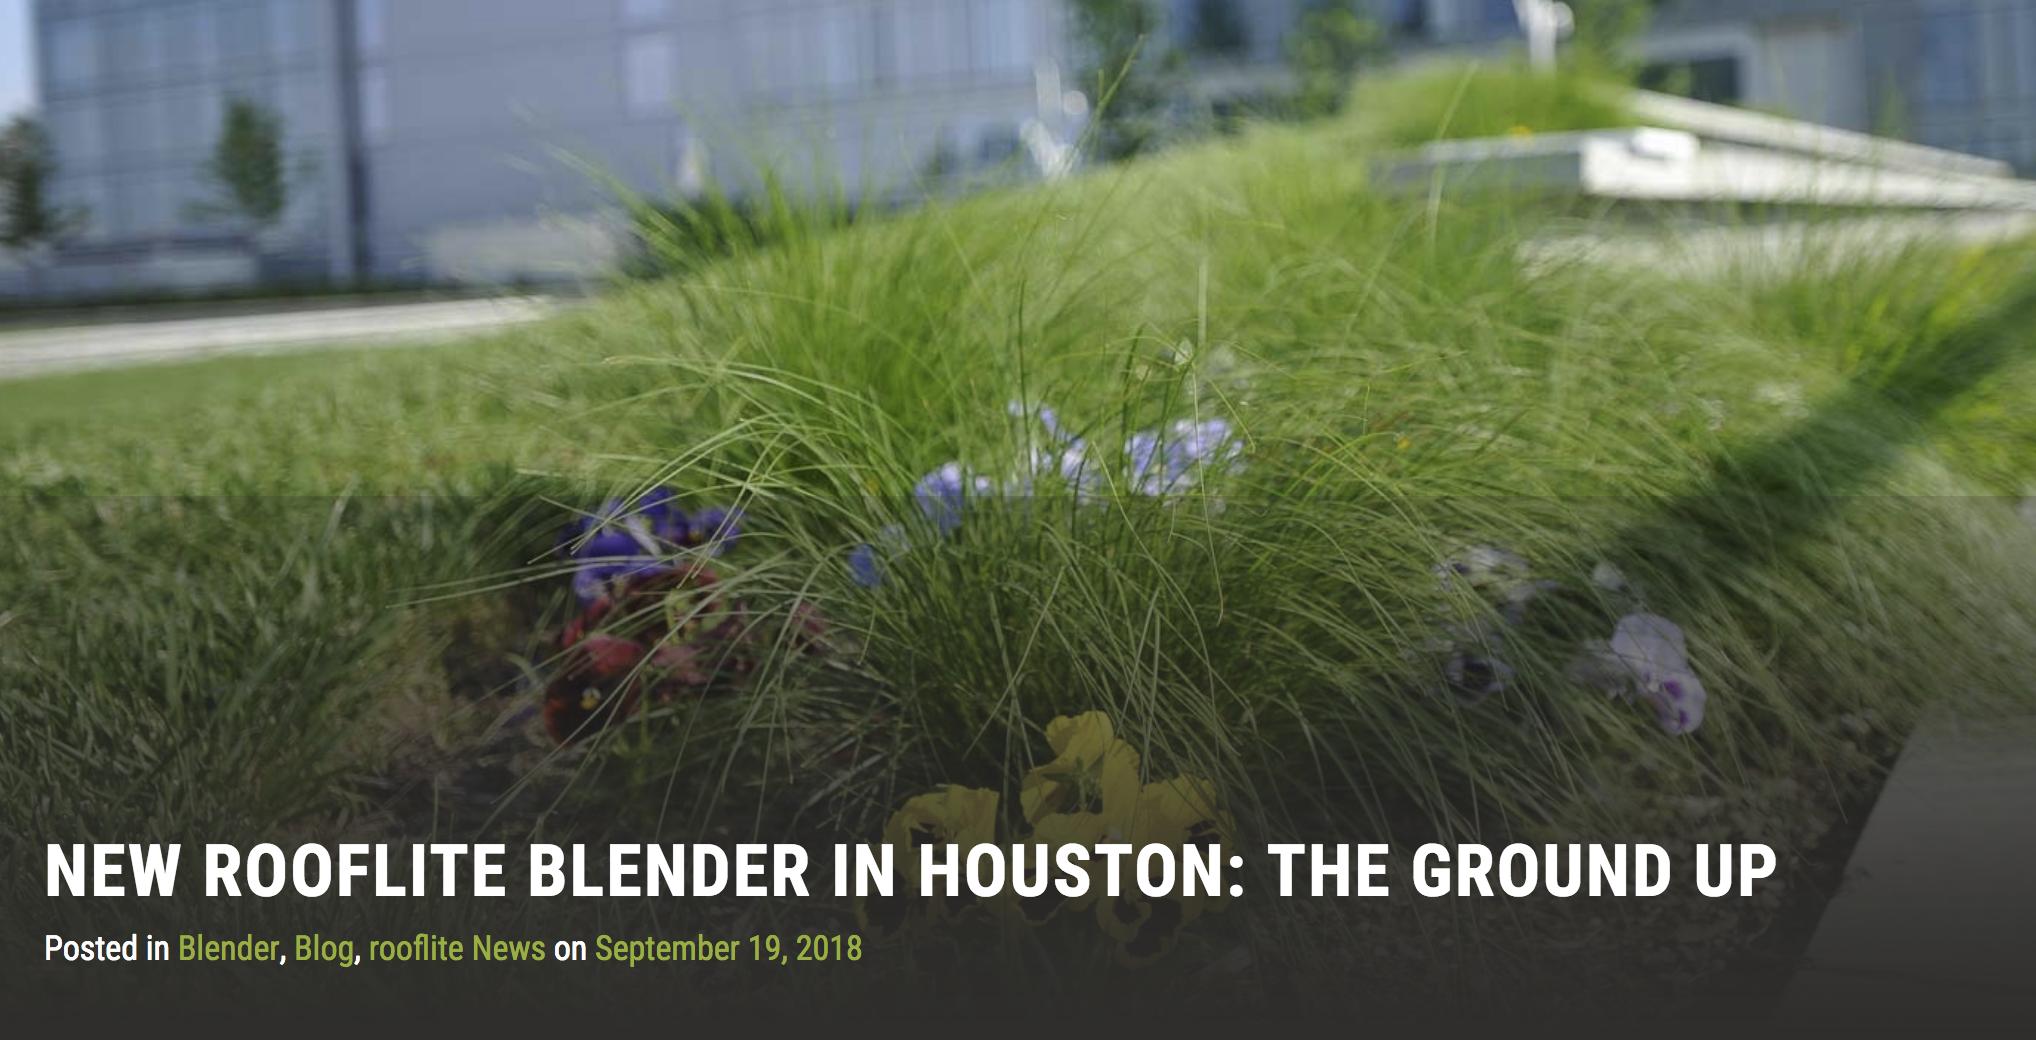 Sources:  https://www.rooflitesoil.com/blog/new-rooflite-blender-in-houston-the-ground-up/